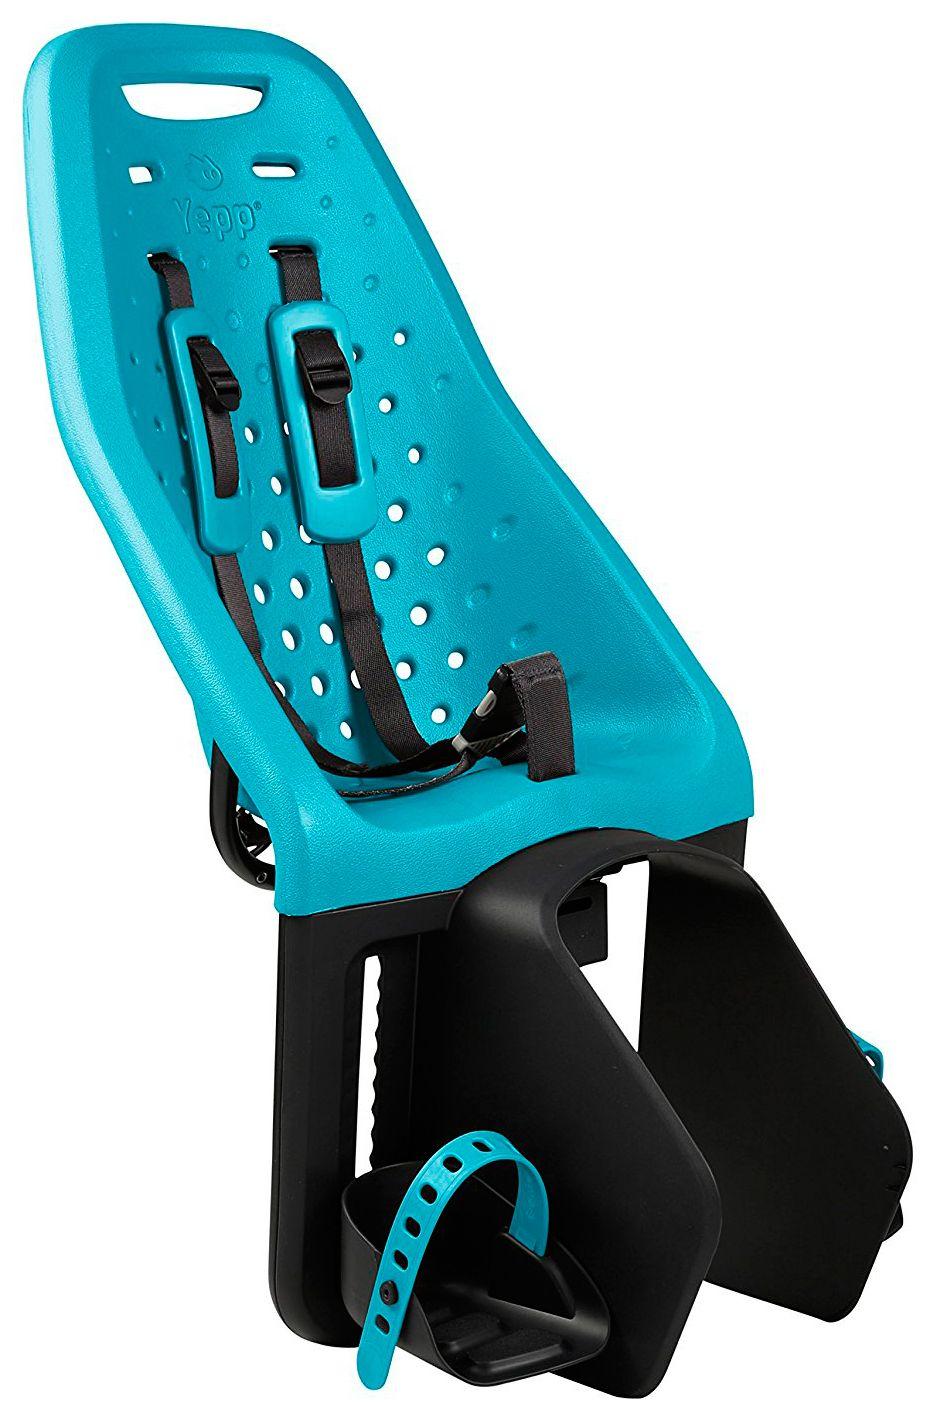 Аксессуар THULE Yepp Maxi Easy Fit детское велокресло thule yepp maxi seat post цвет черный